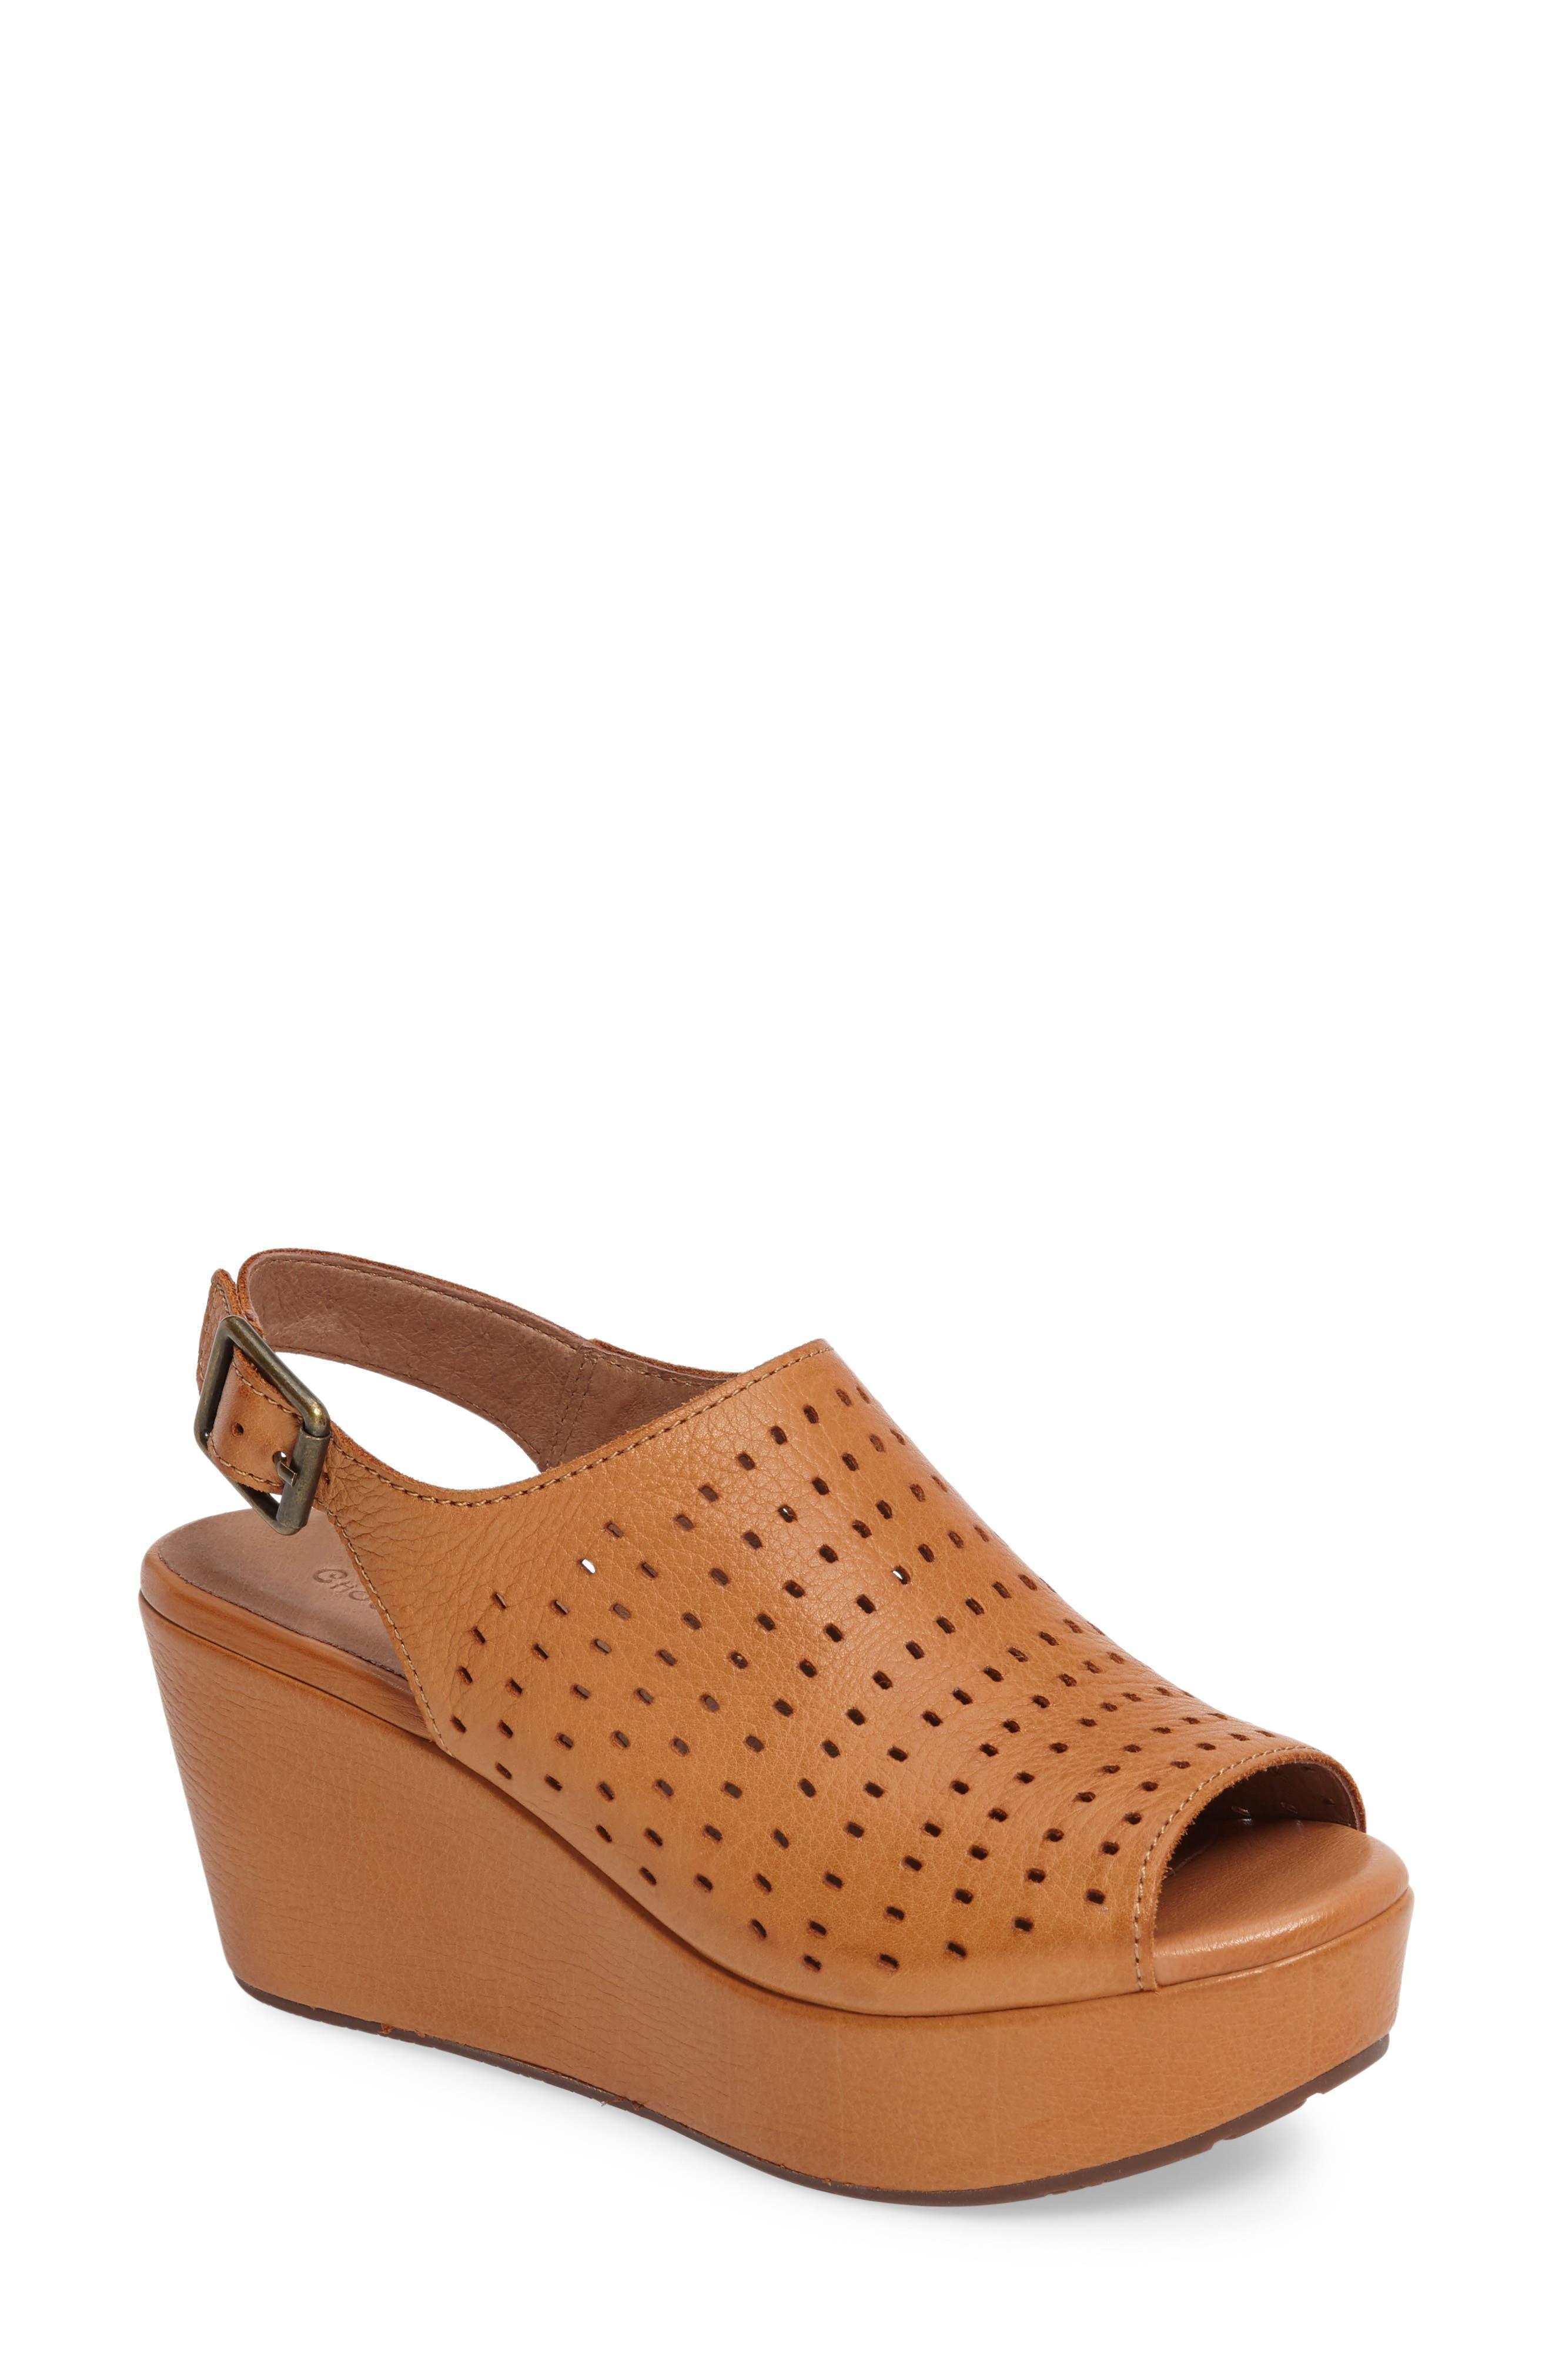 Wala Perforated Wedge Sandal,                             Main thumbnail 1, color,                             200